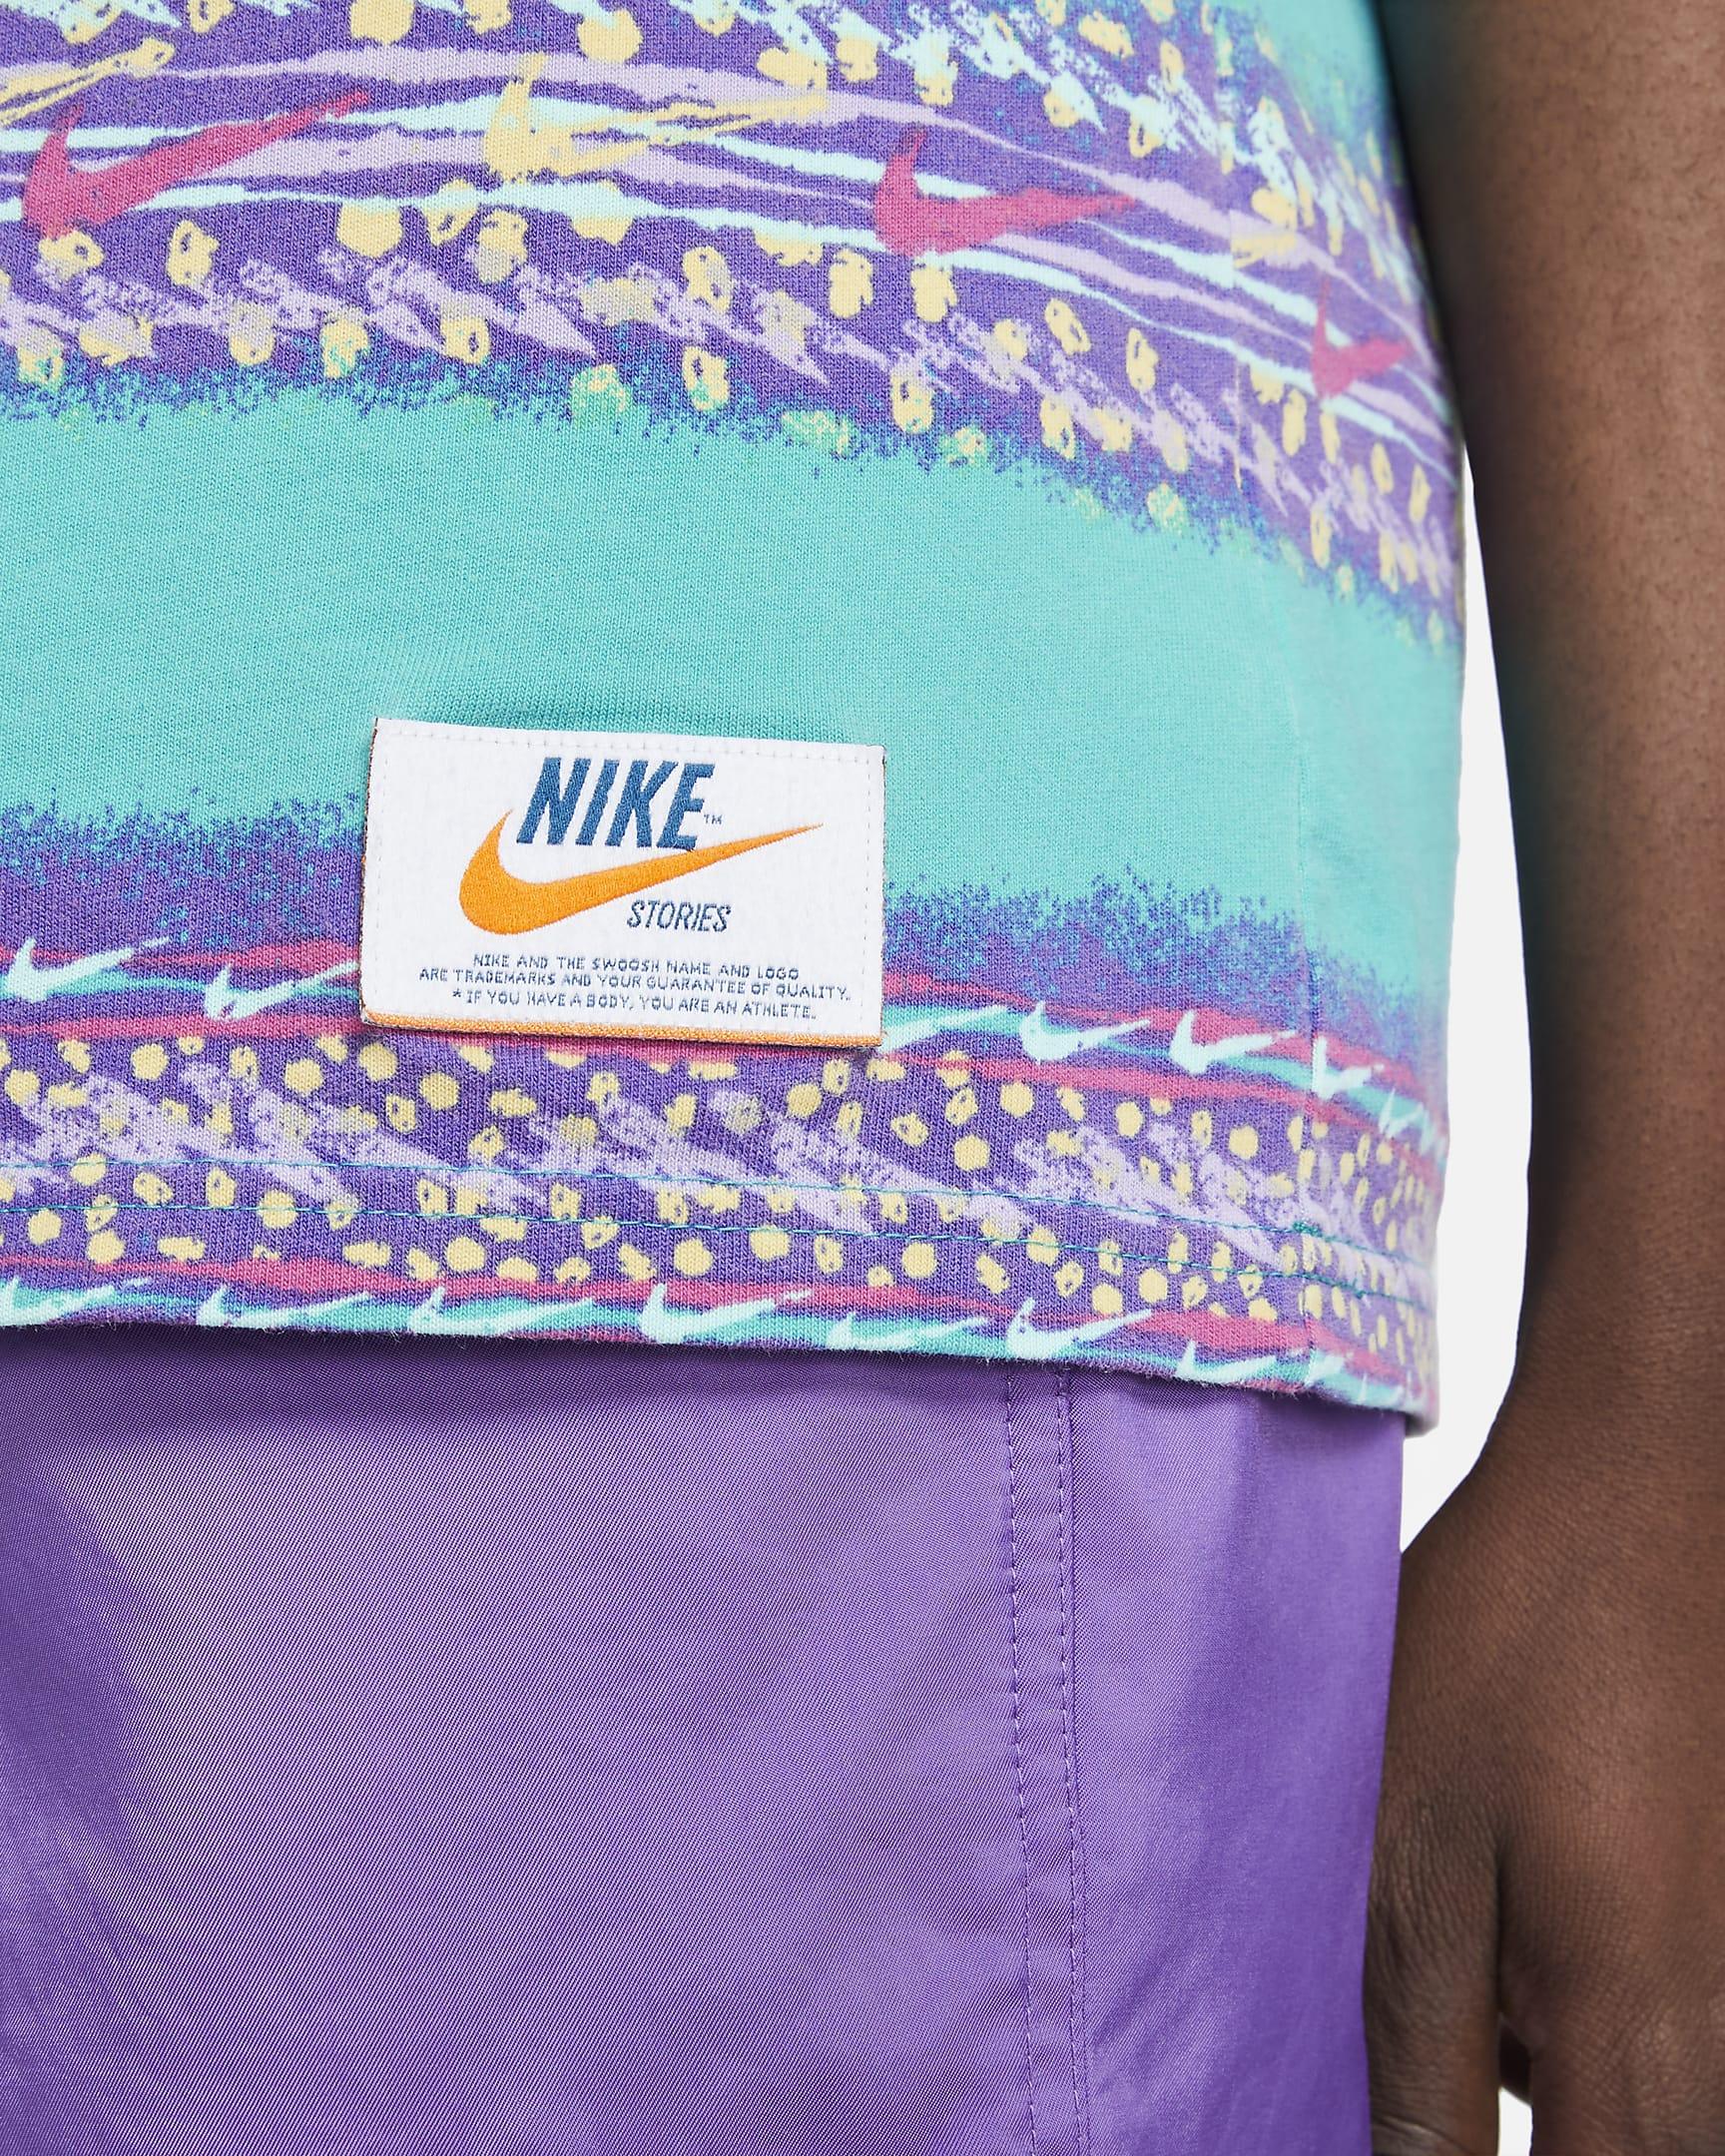 nike-sportswear-stories-mens-max-90-t-shirt-7vVnv1-3.png